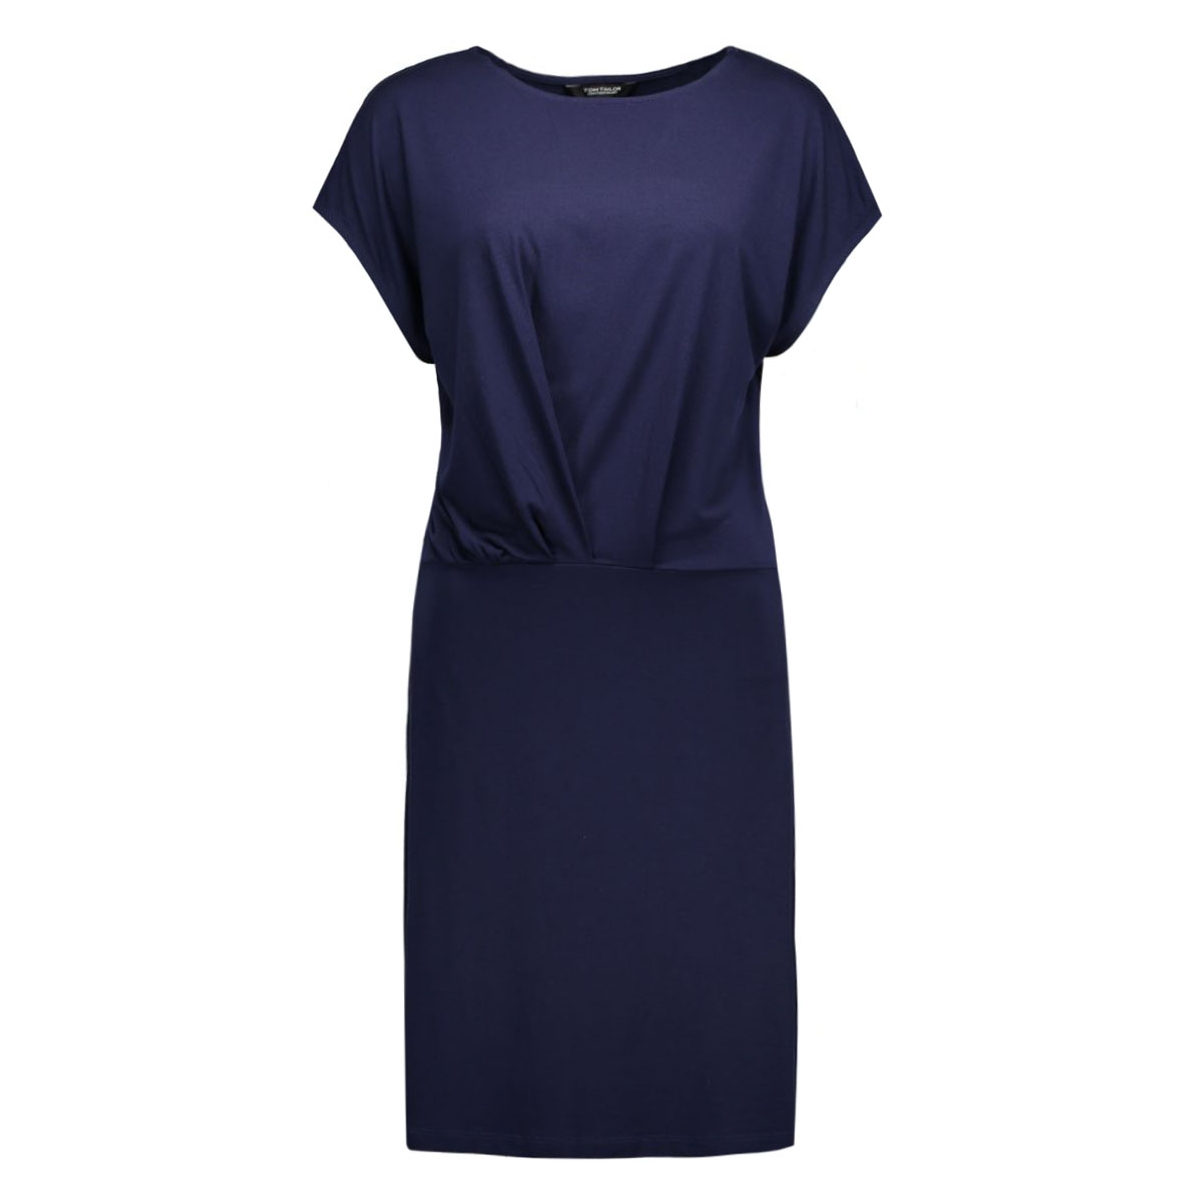 5019284.00.75 tom tailor jurk 6946